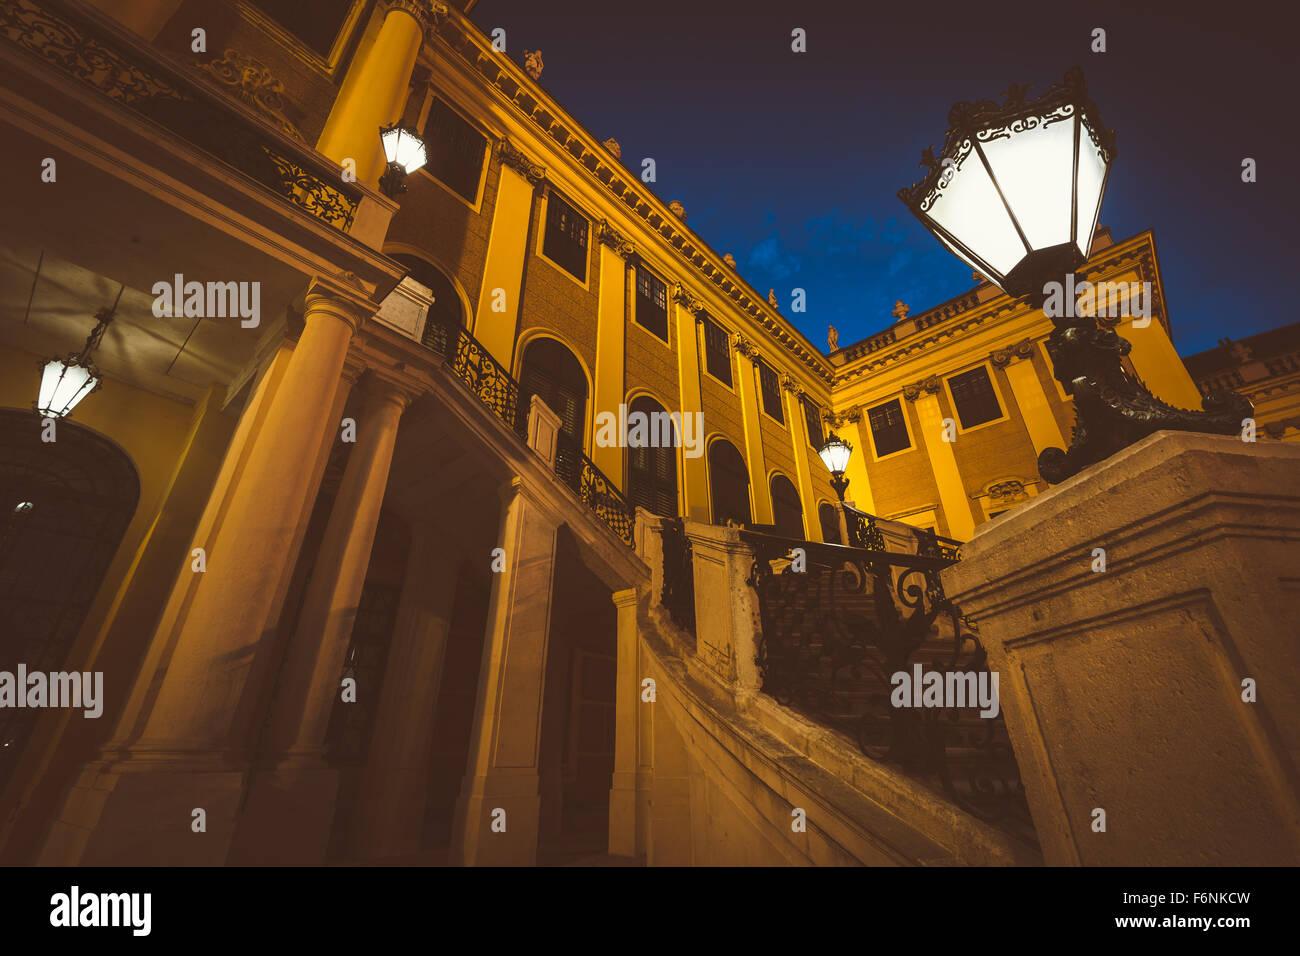 Schönbrunn Palace at night, in Vienna, Austria. - Stock Image